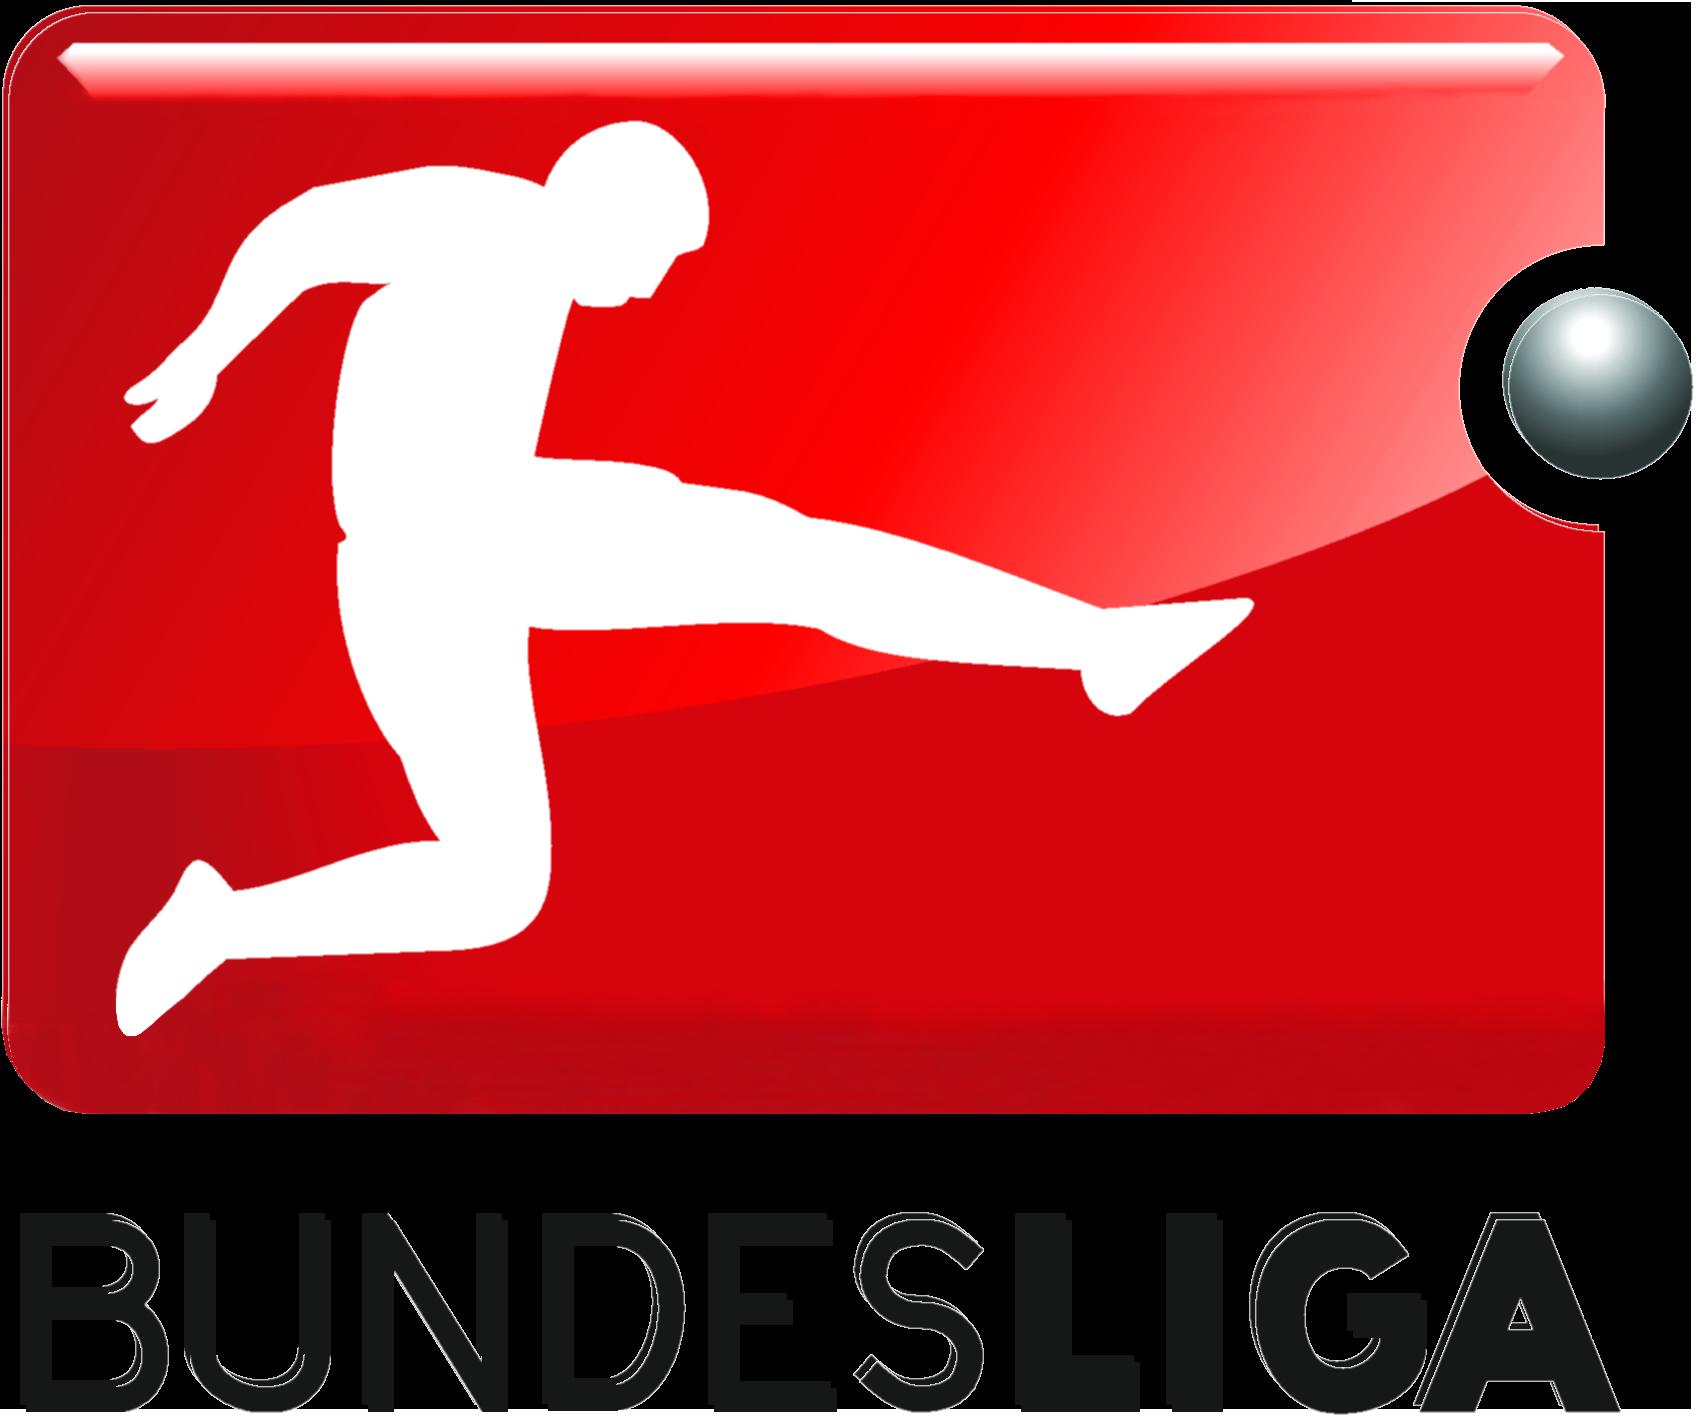 The German League = BundesLiga. Germany always produces